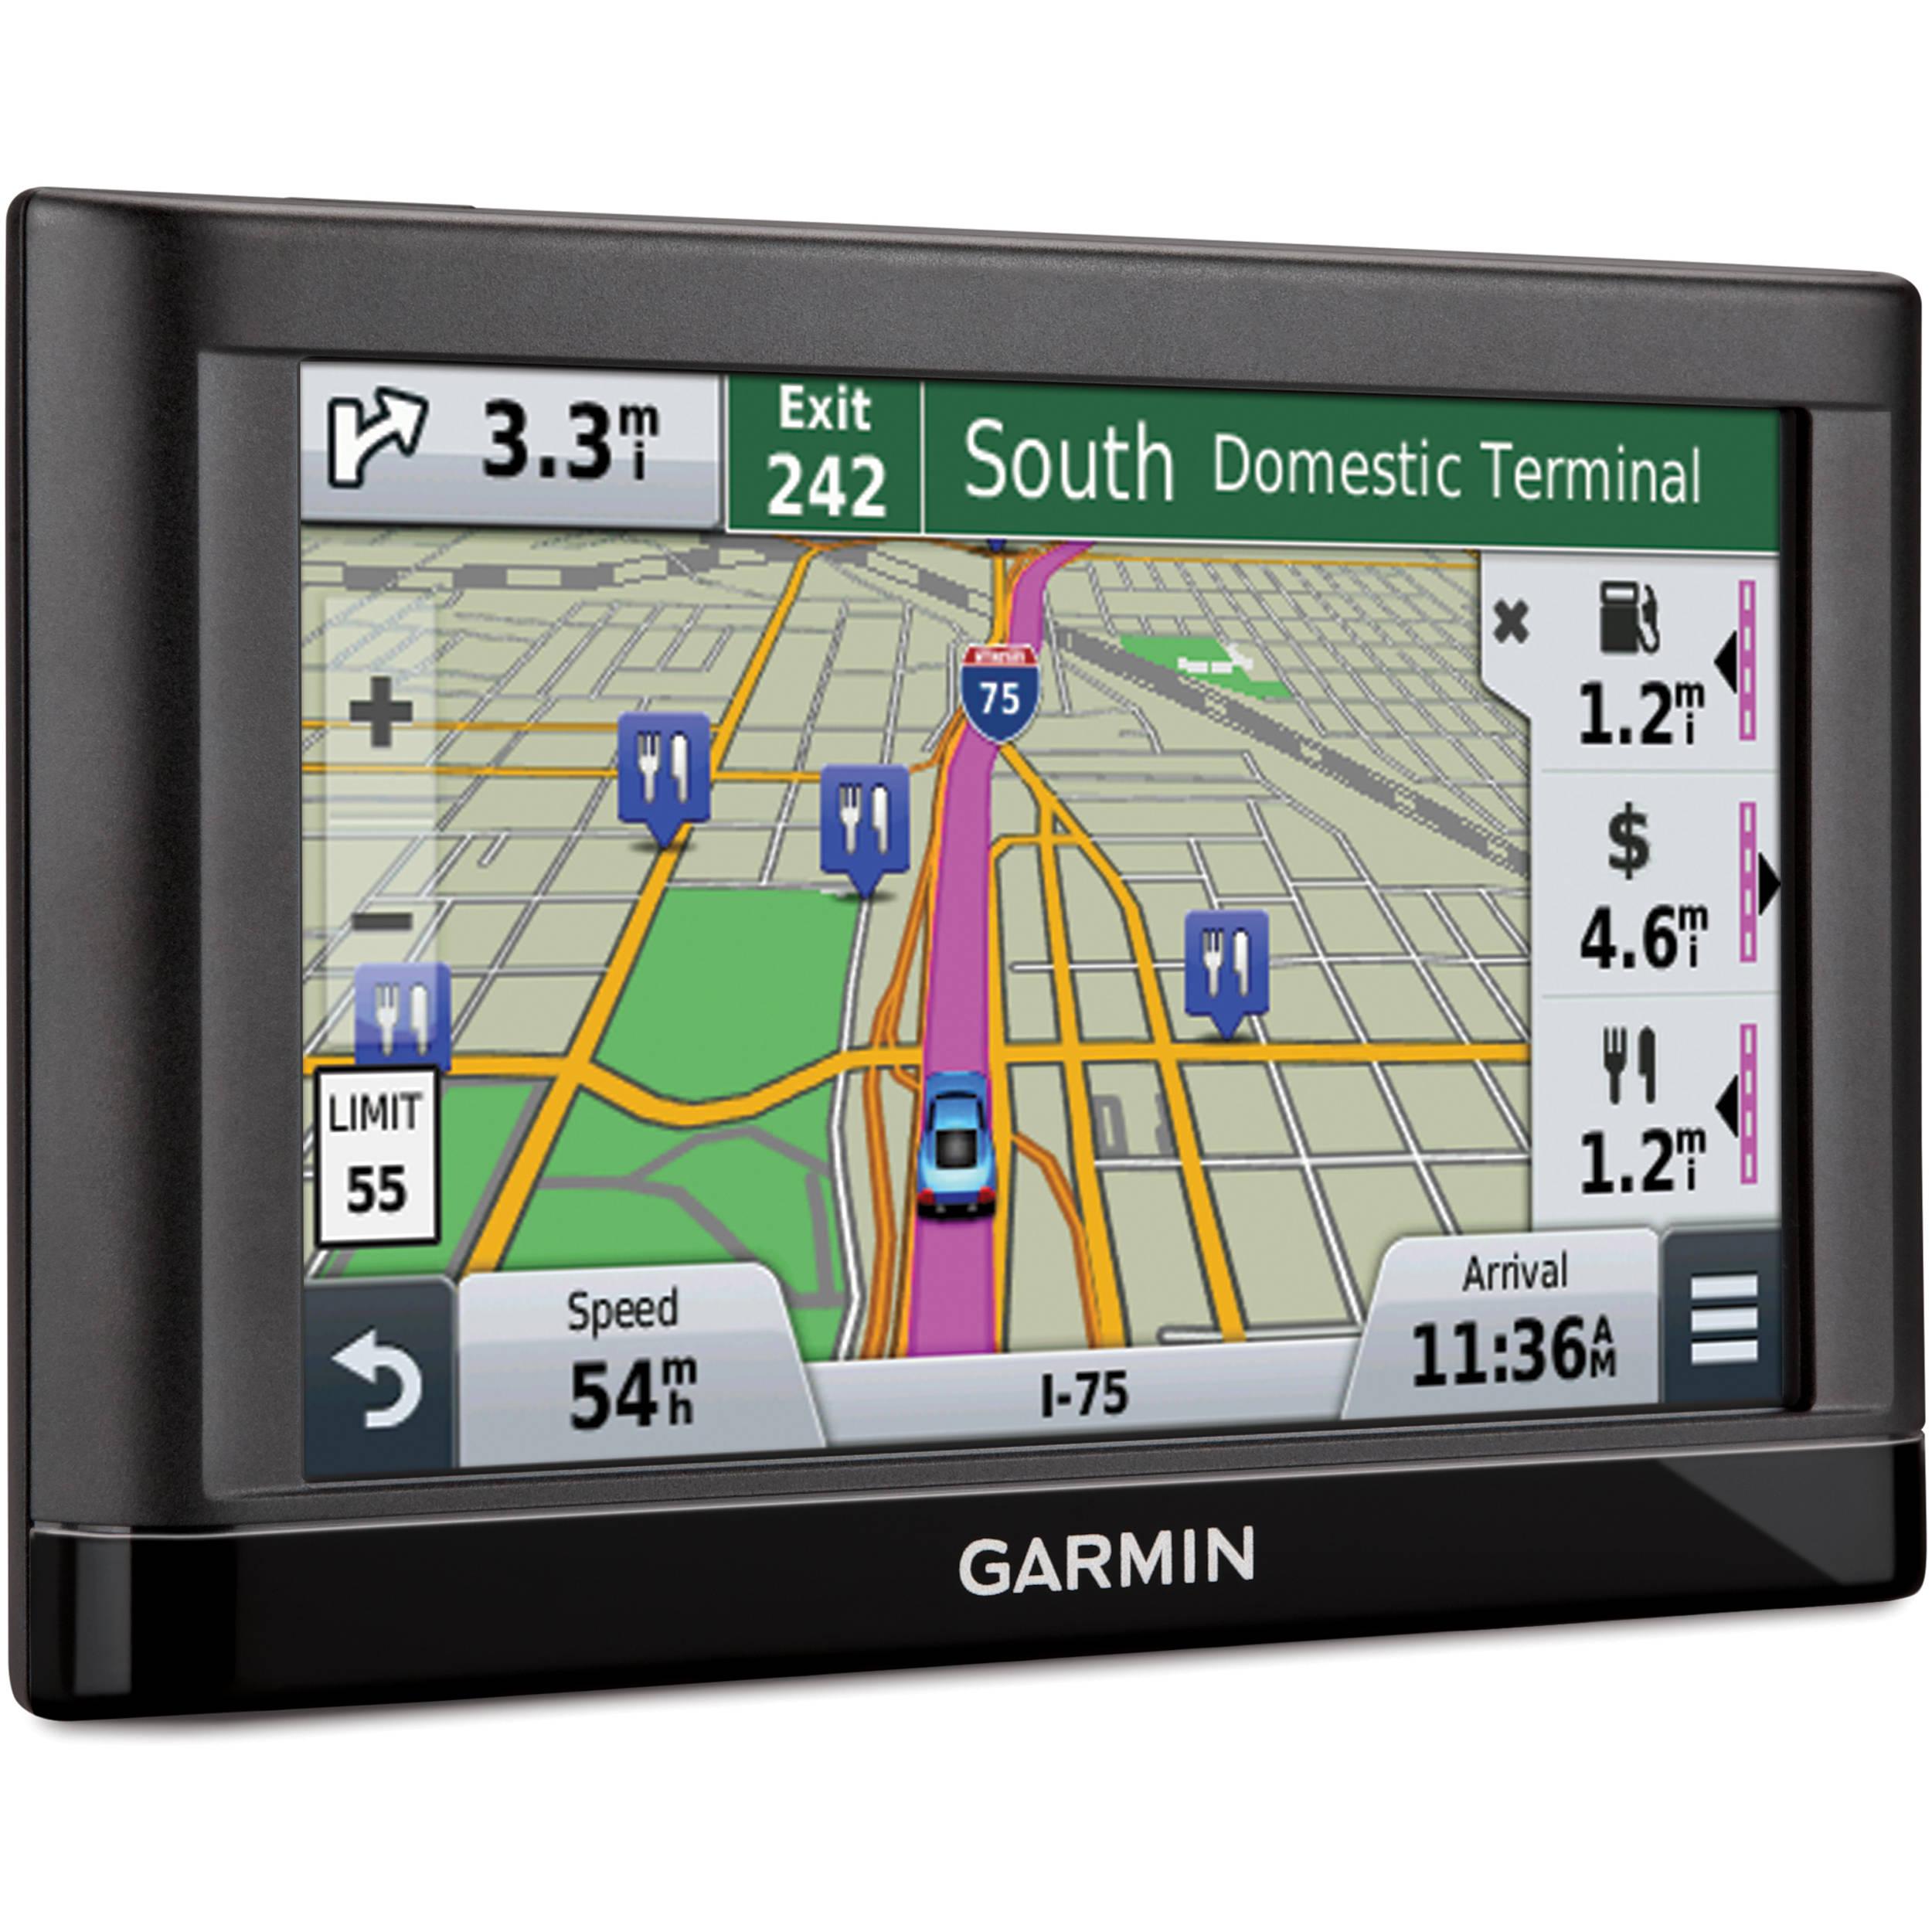 Canada Map For Garmin Nuvi Garmin Nuvi 56LM GPS With US/Canada Maps Maps 010 01198 03 B&H